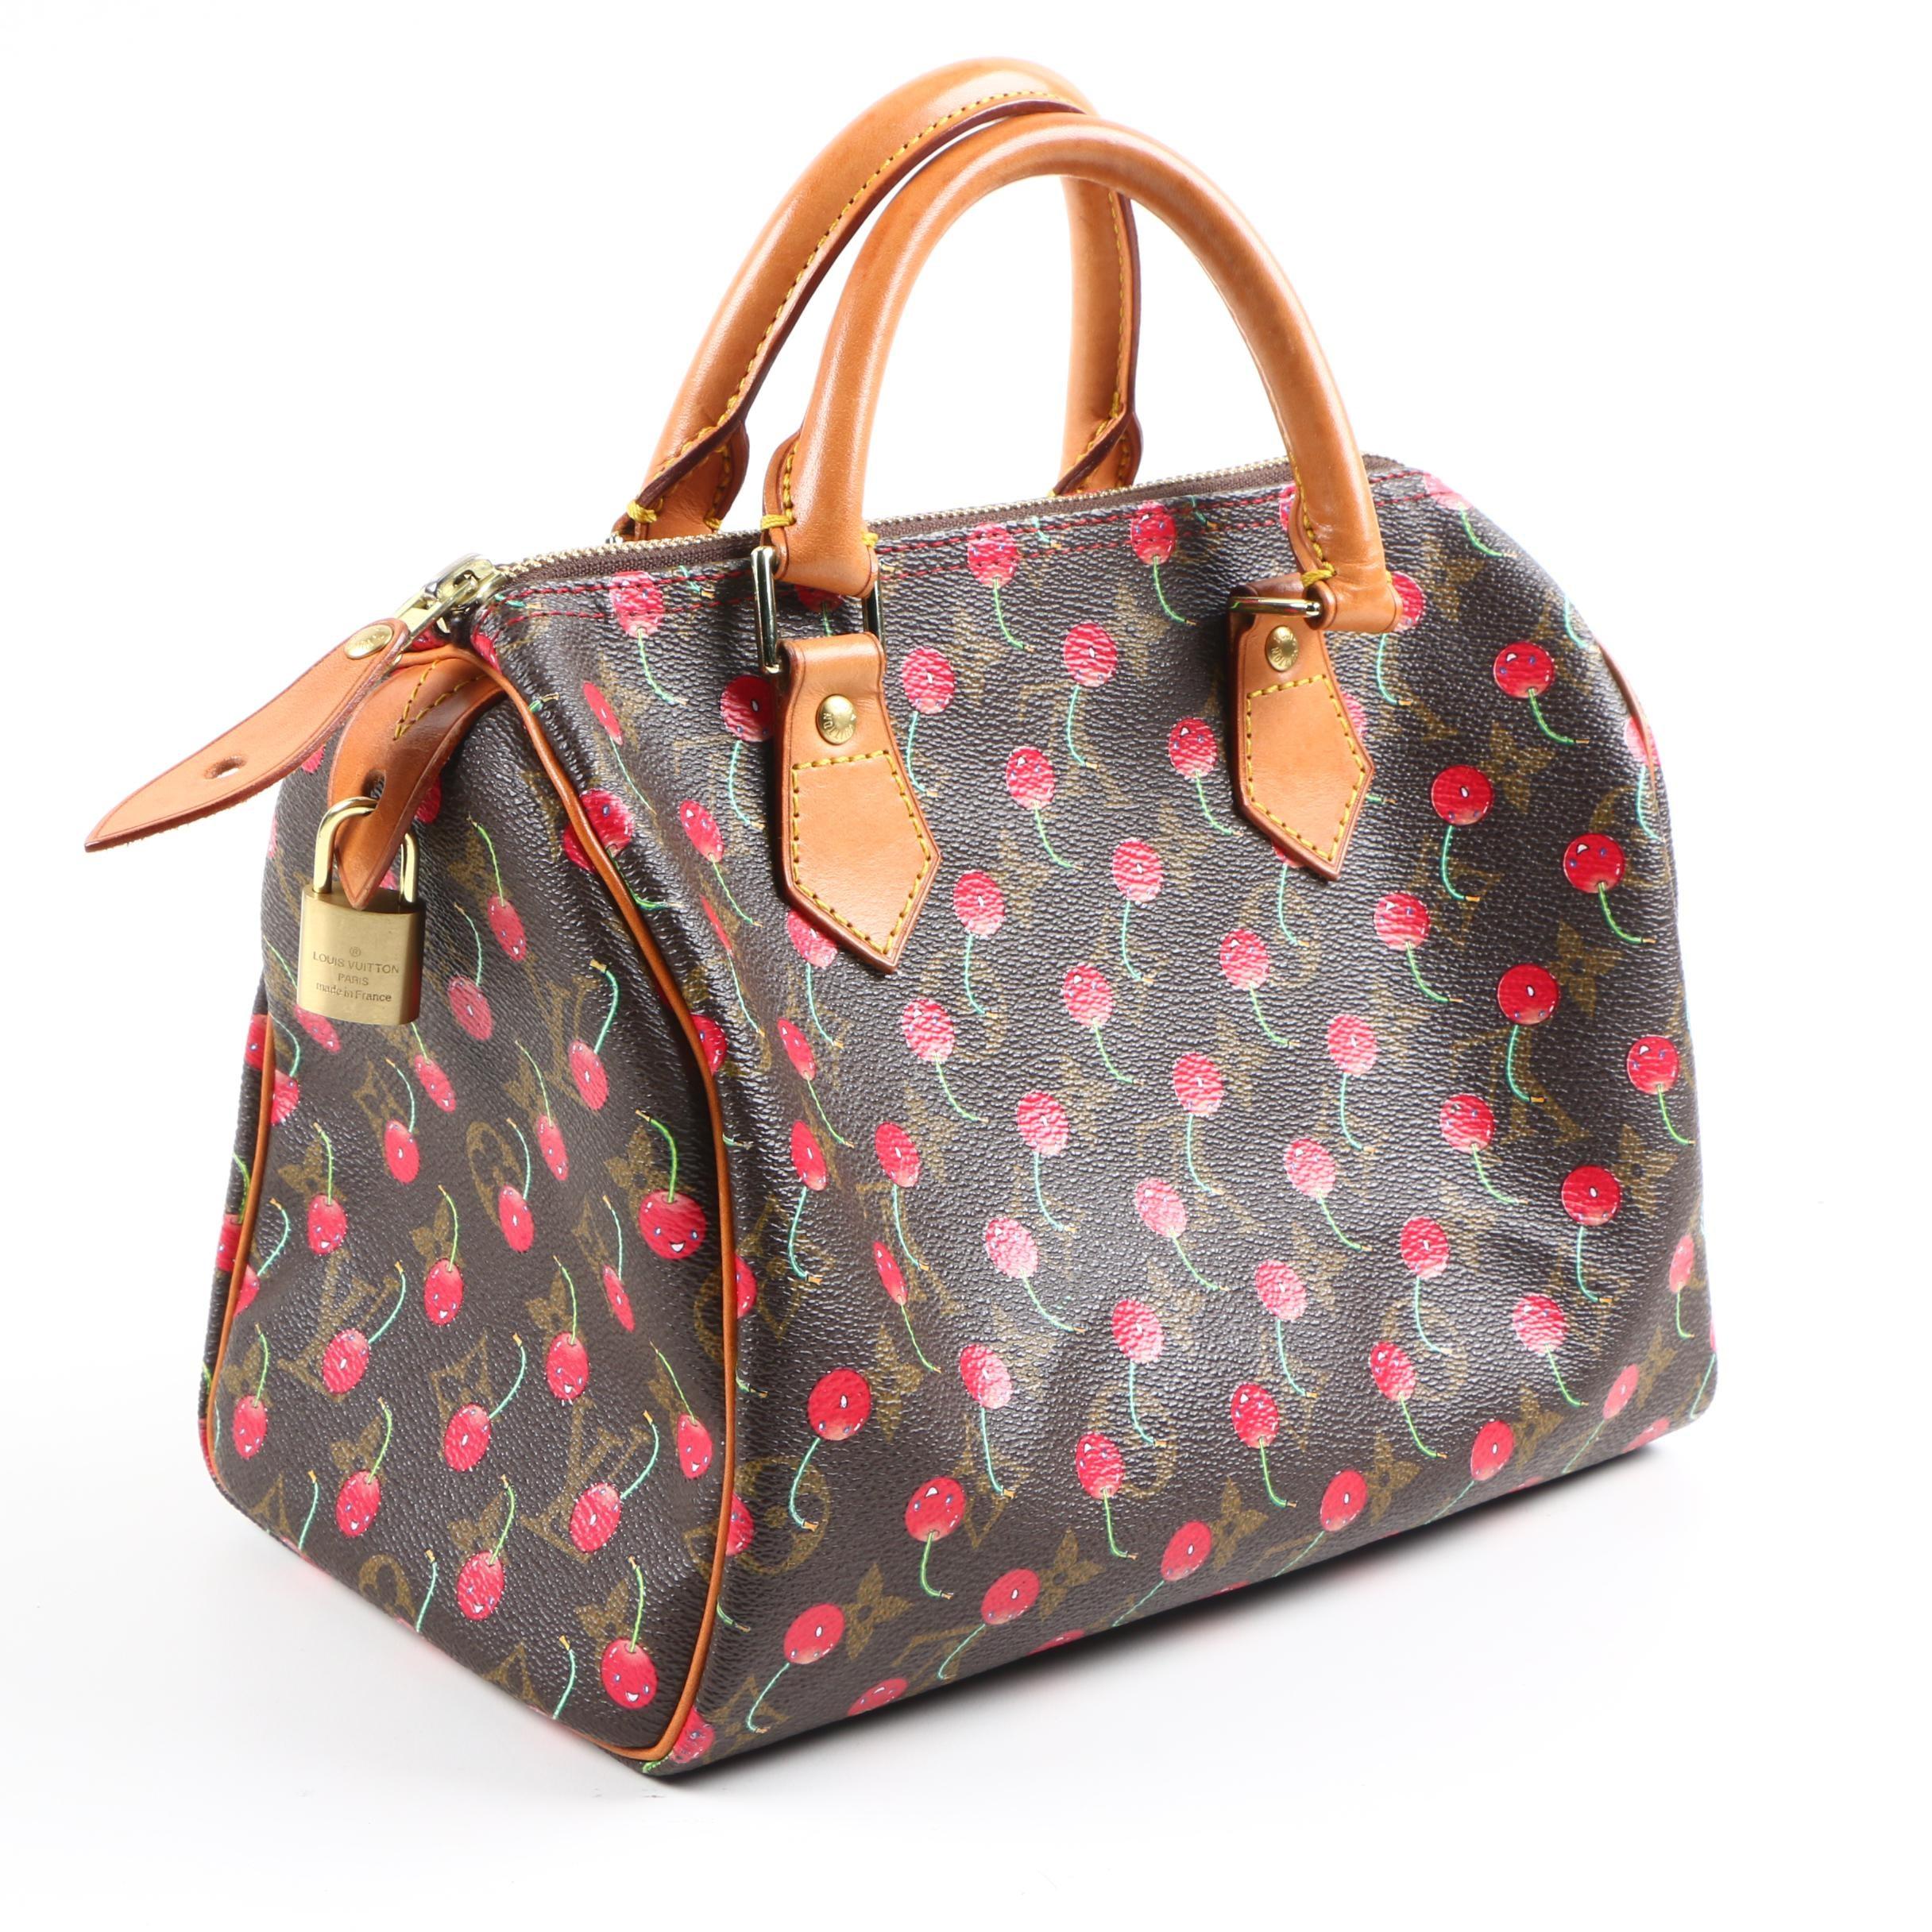 Louis Vuitton Limited Edition Monogram Cerises Cherry Speedy 25